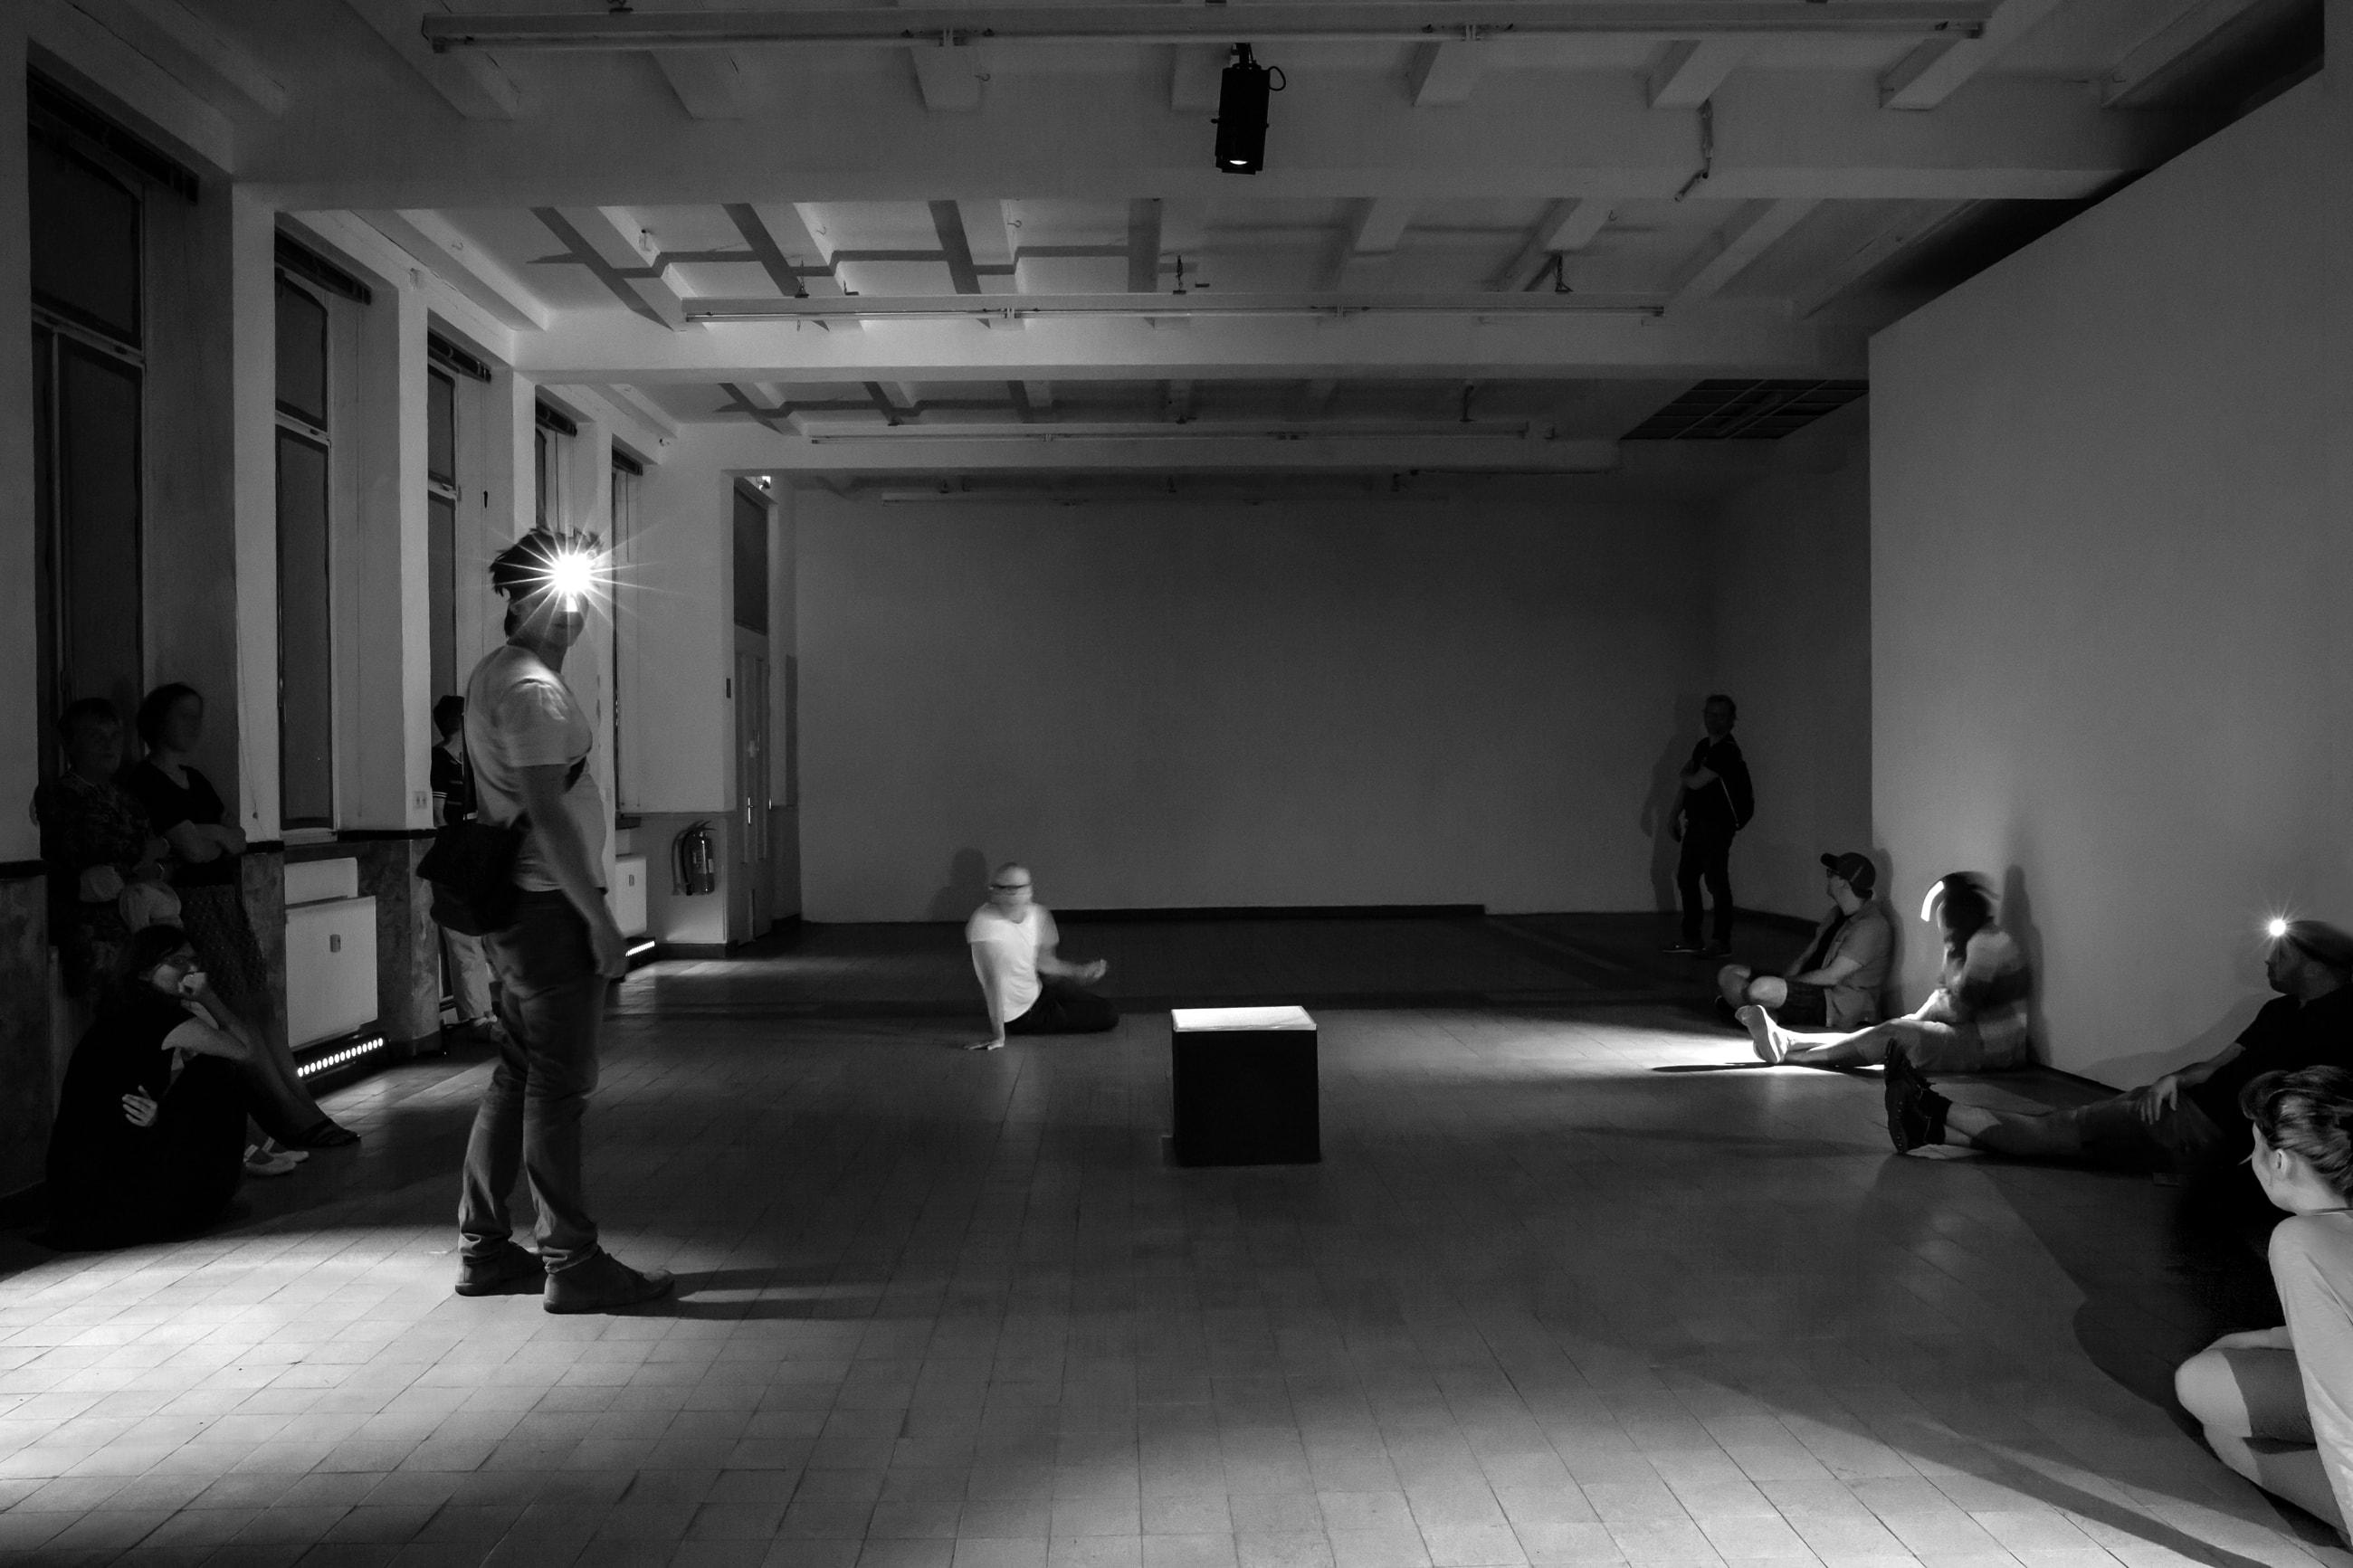 Theaterfestival Schwindelfrei, Unperforming ©Lys Y. Seng